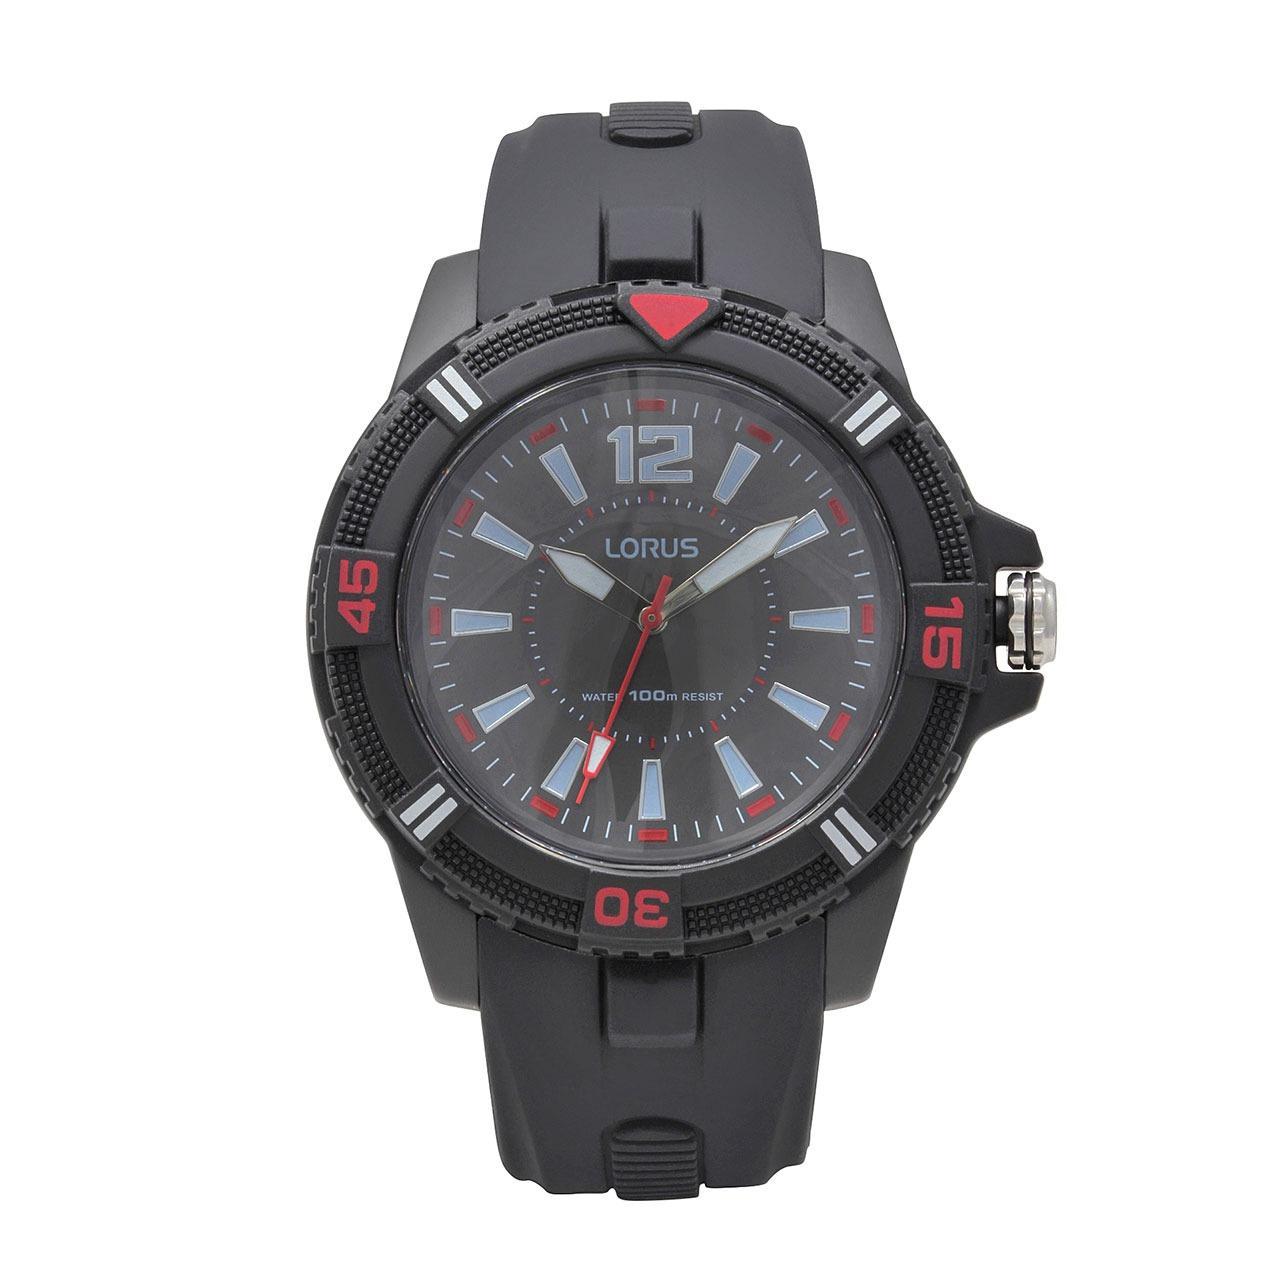 LORUS Jam Tangan - Black - Silicon - RRX11FX9